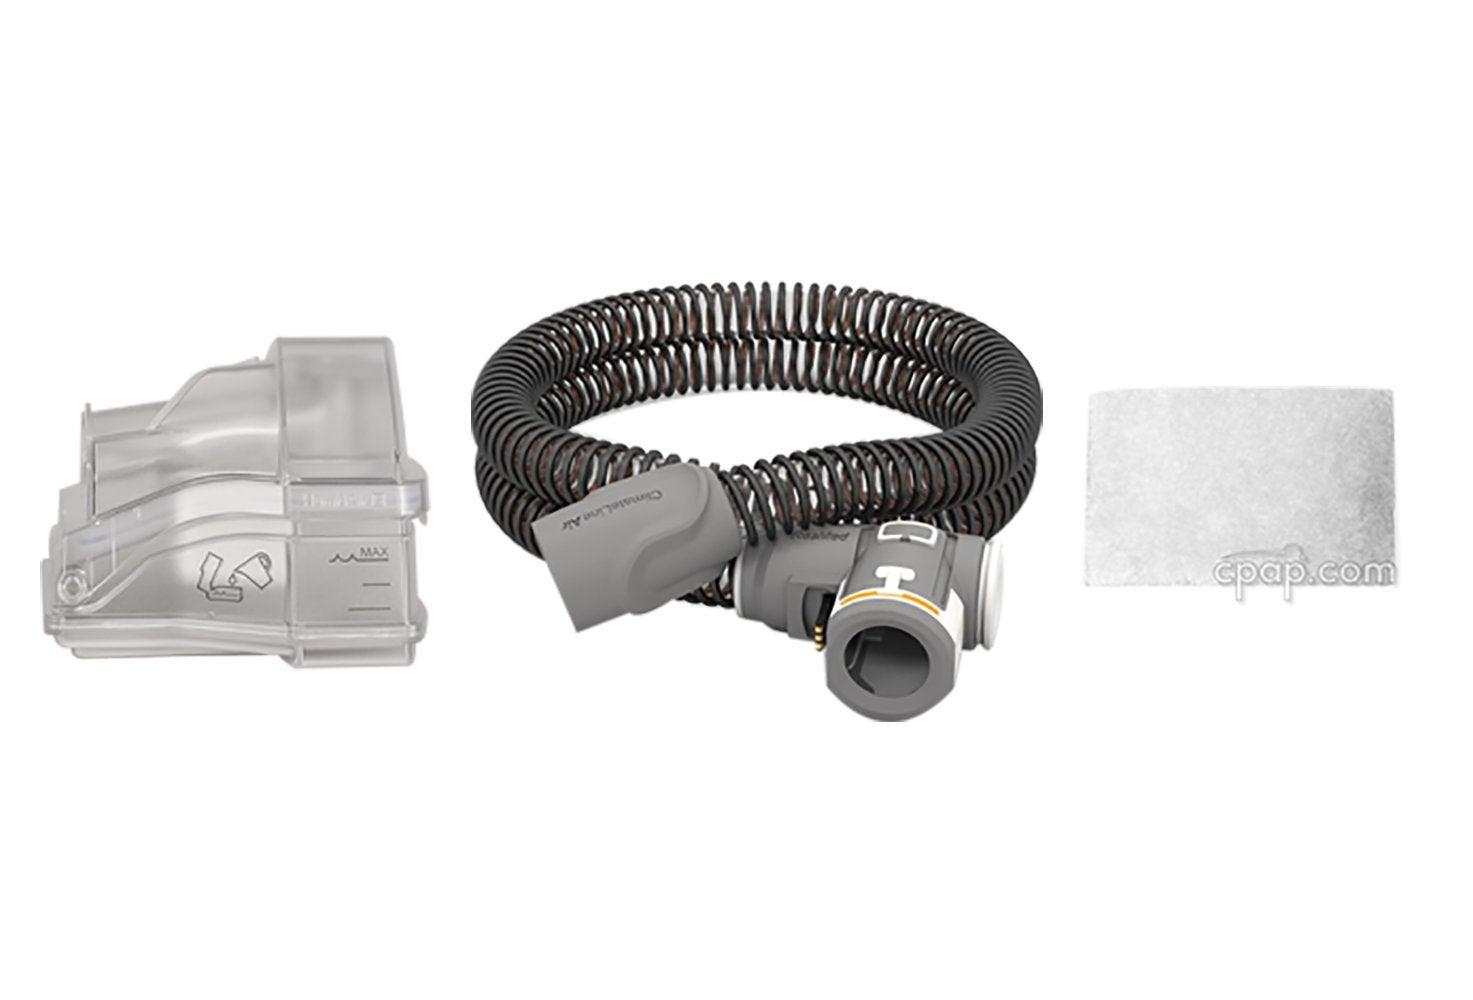 AirSense 10 Maintenance Bundle: Standard Water Chamber + ClimateLine Air + 6 Pack of Filters